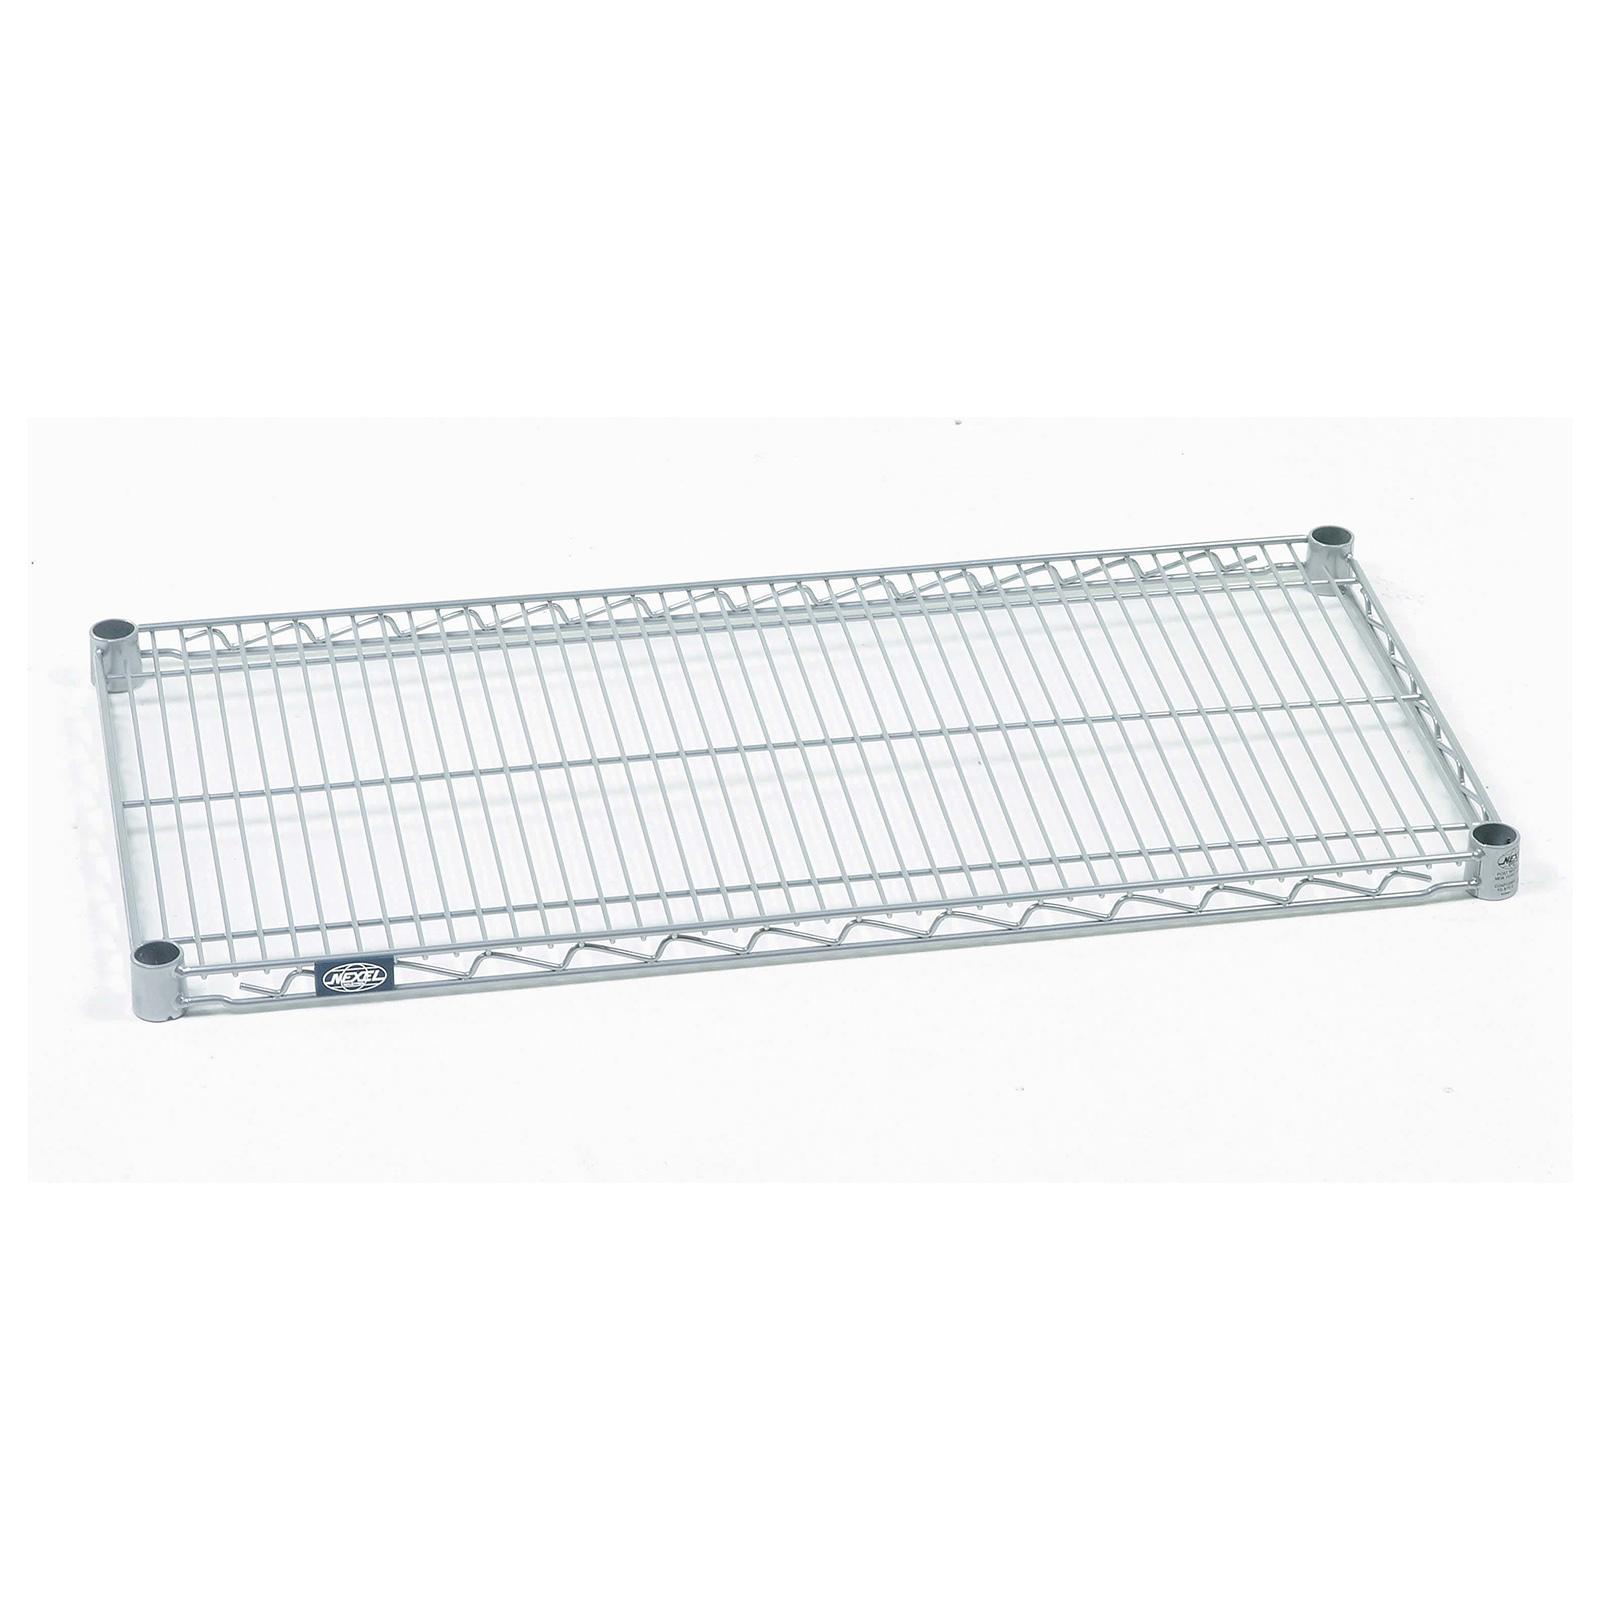 NEXEL S3036EP shelving, wire